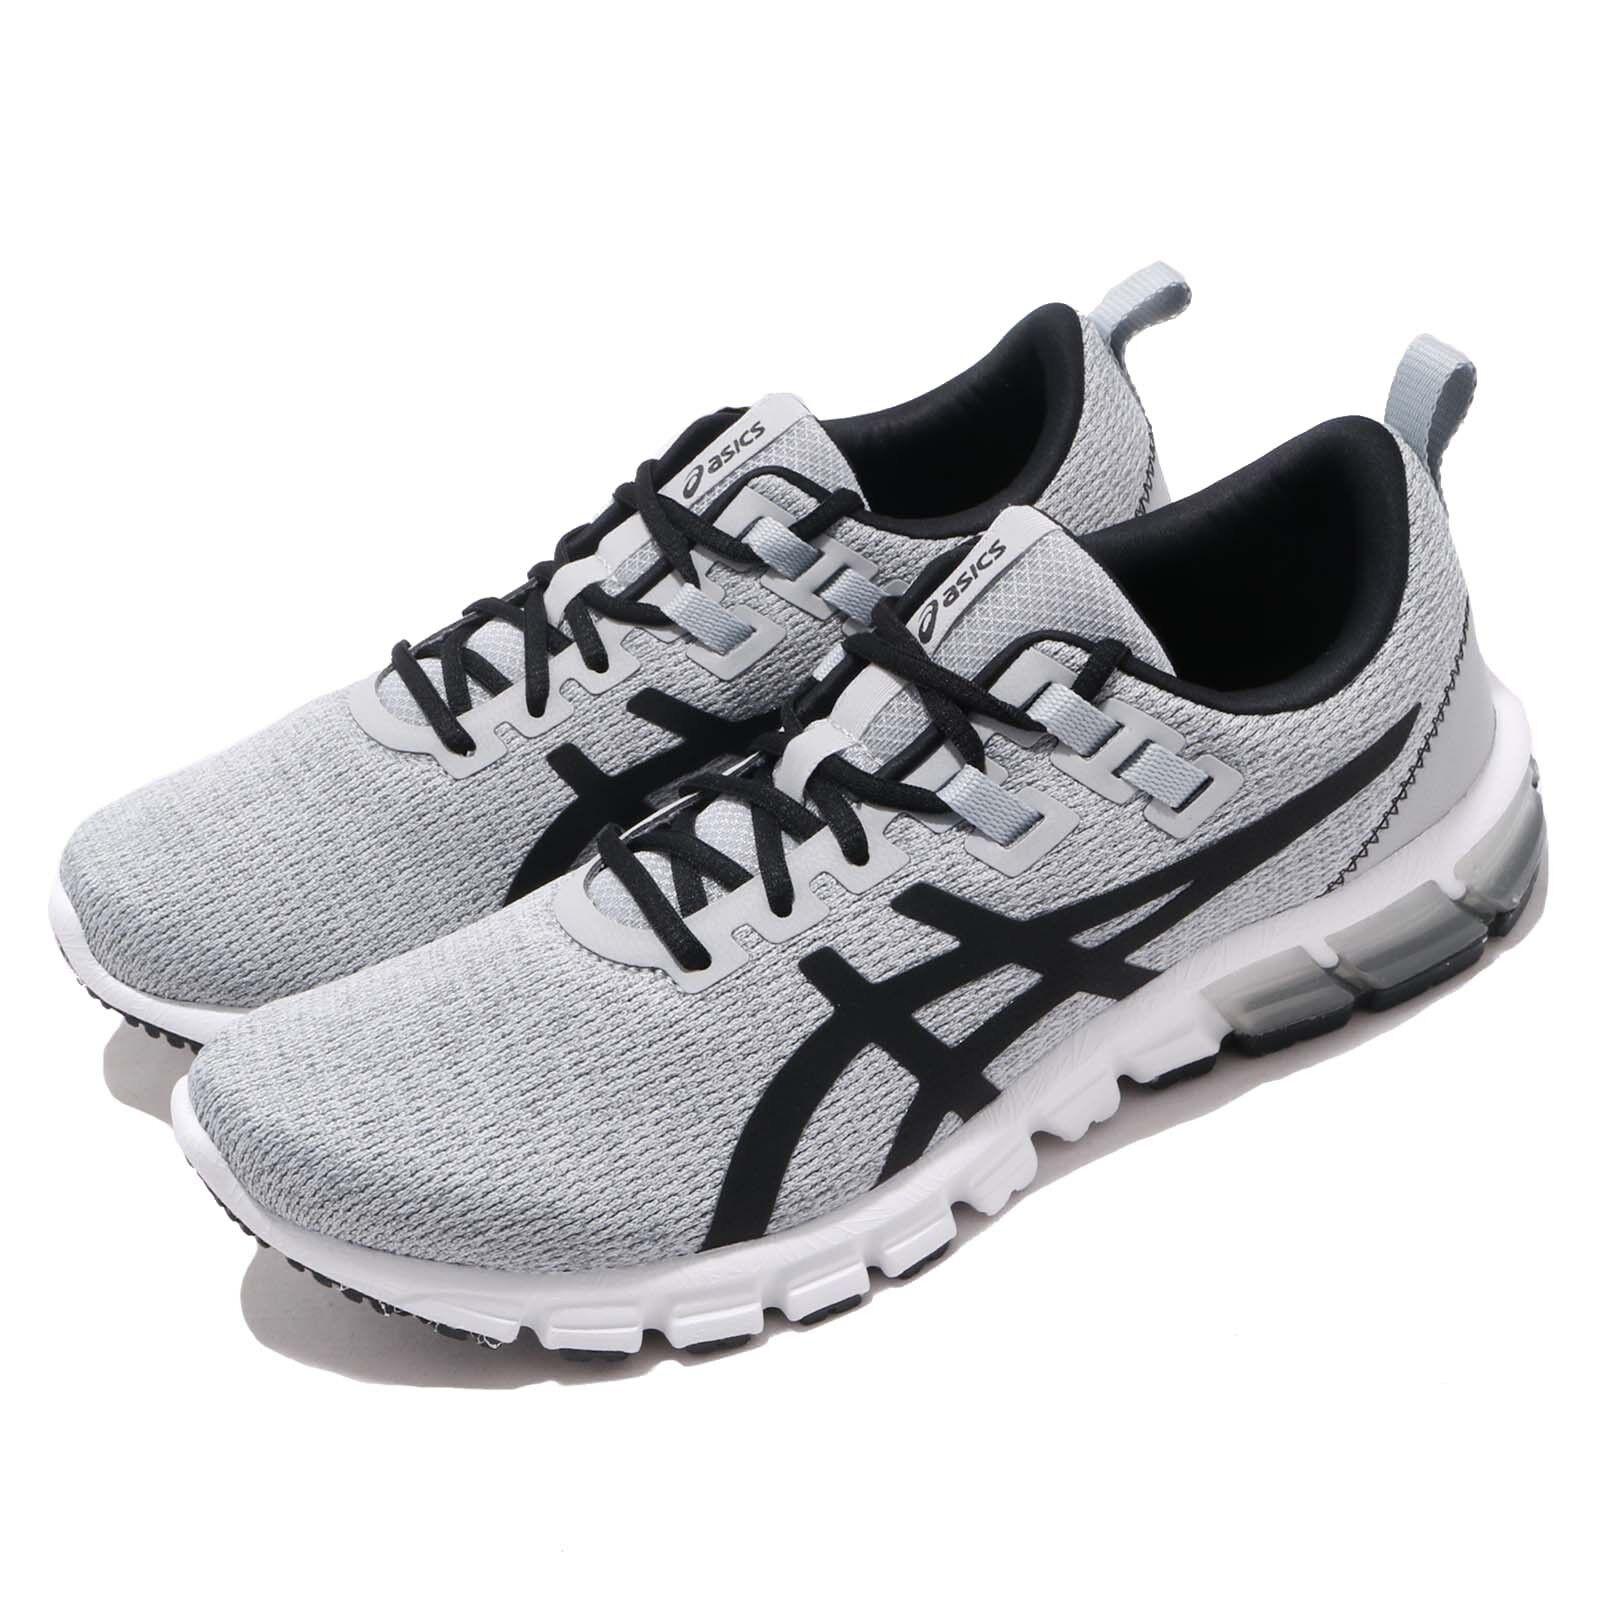 Asics Gel Quantum 90 gris Negro blancoo Hombres Running Zapatos TENIS 1021A123-020